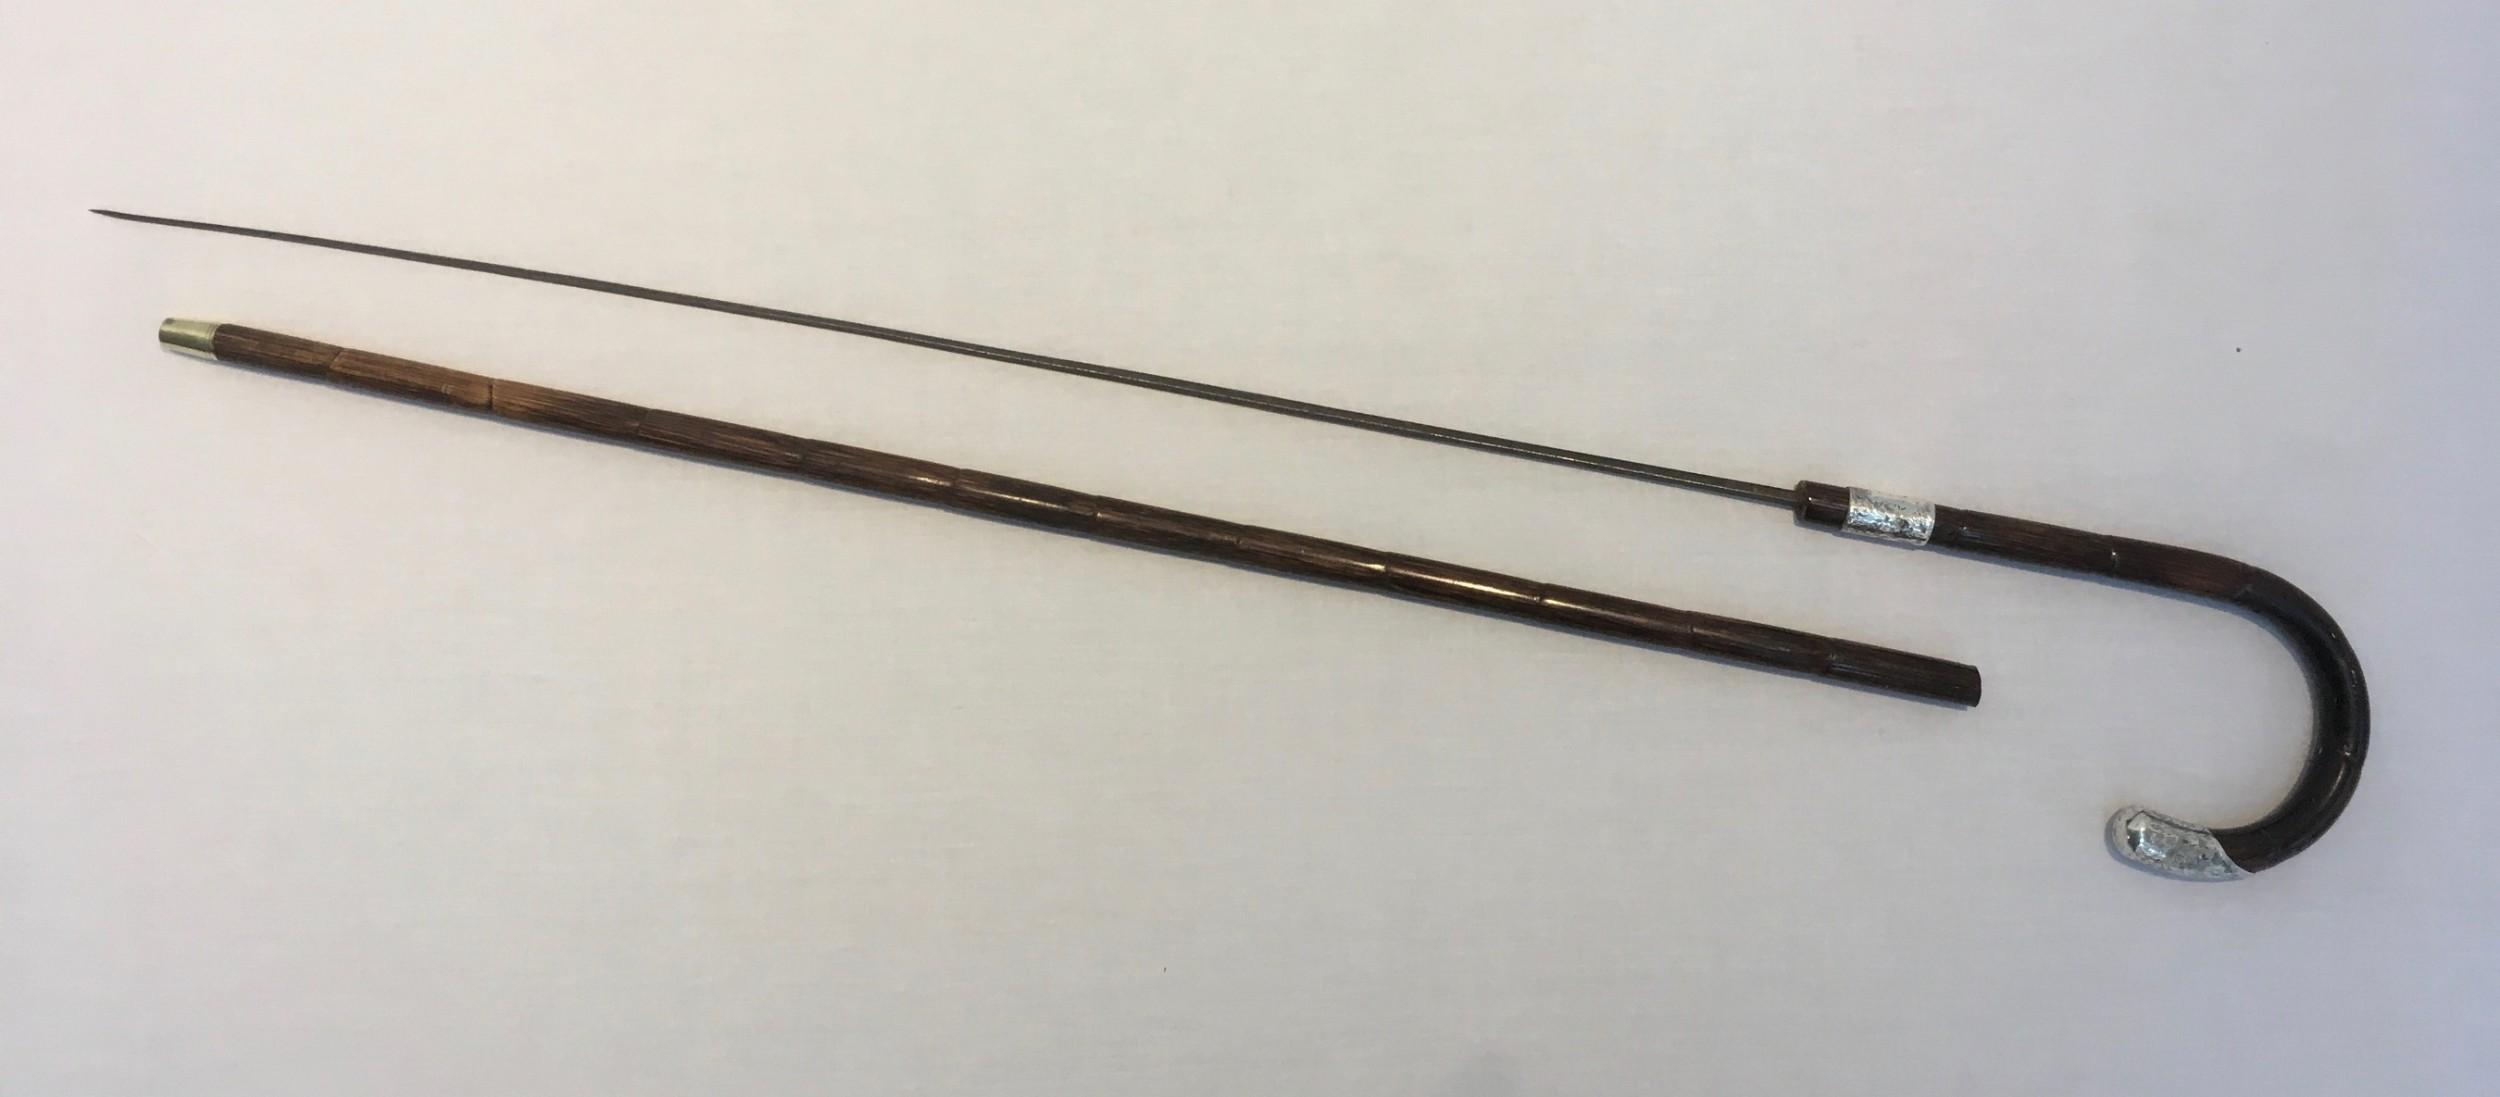 silver crook handled sword stick 1885